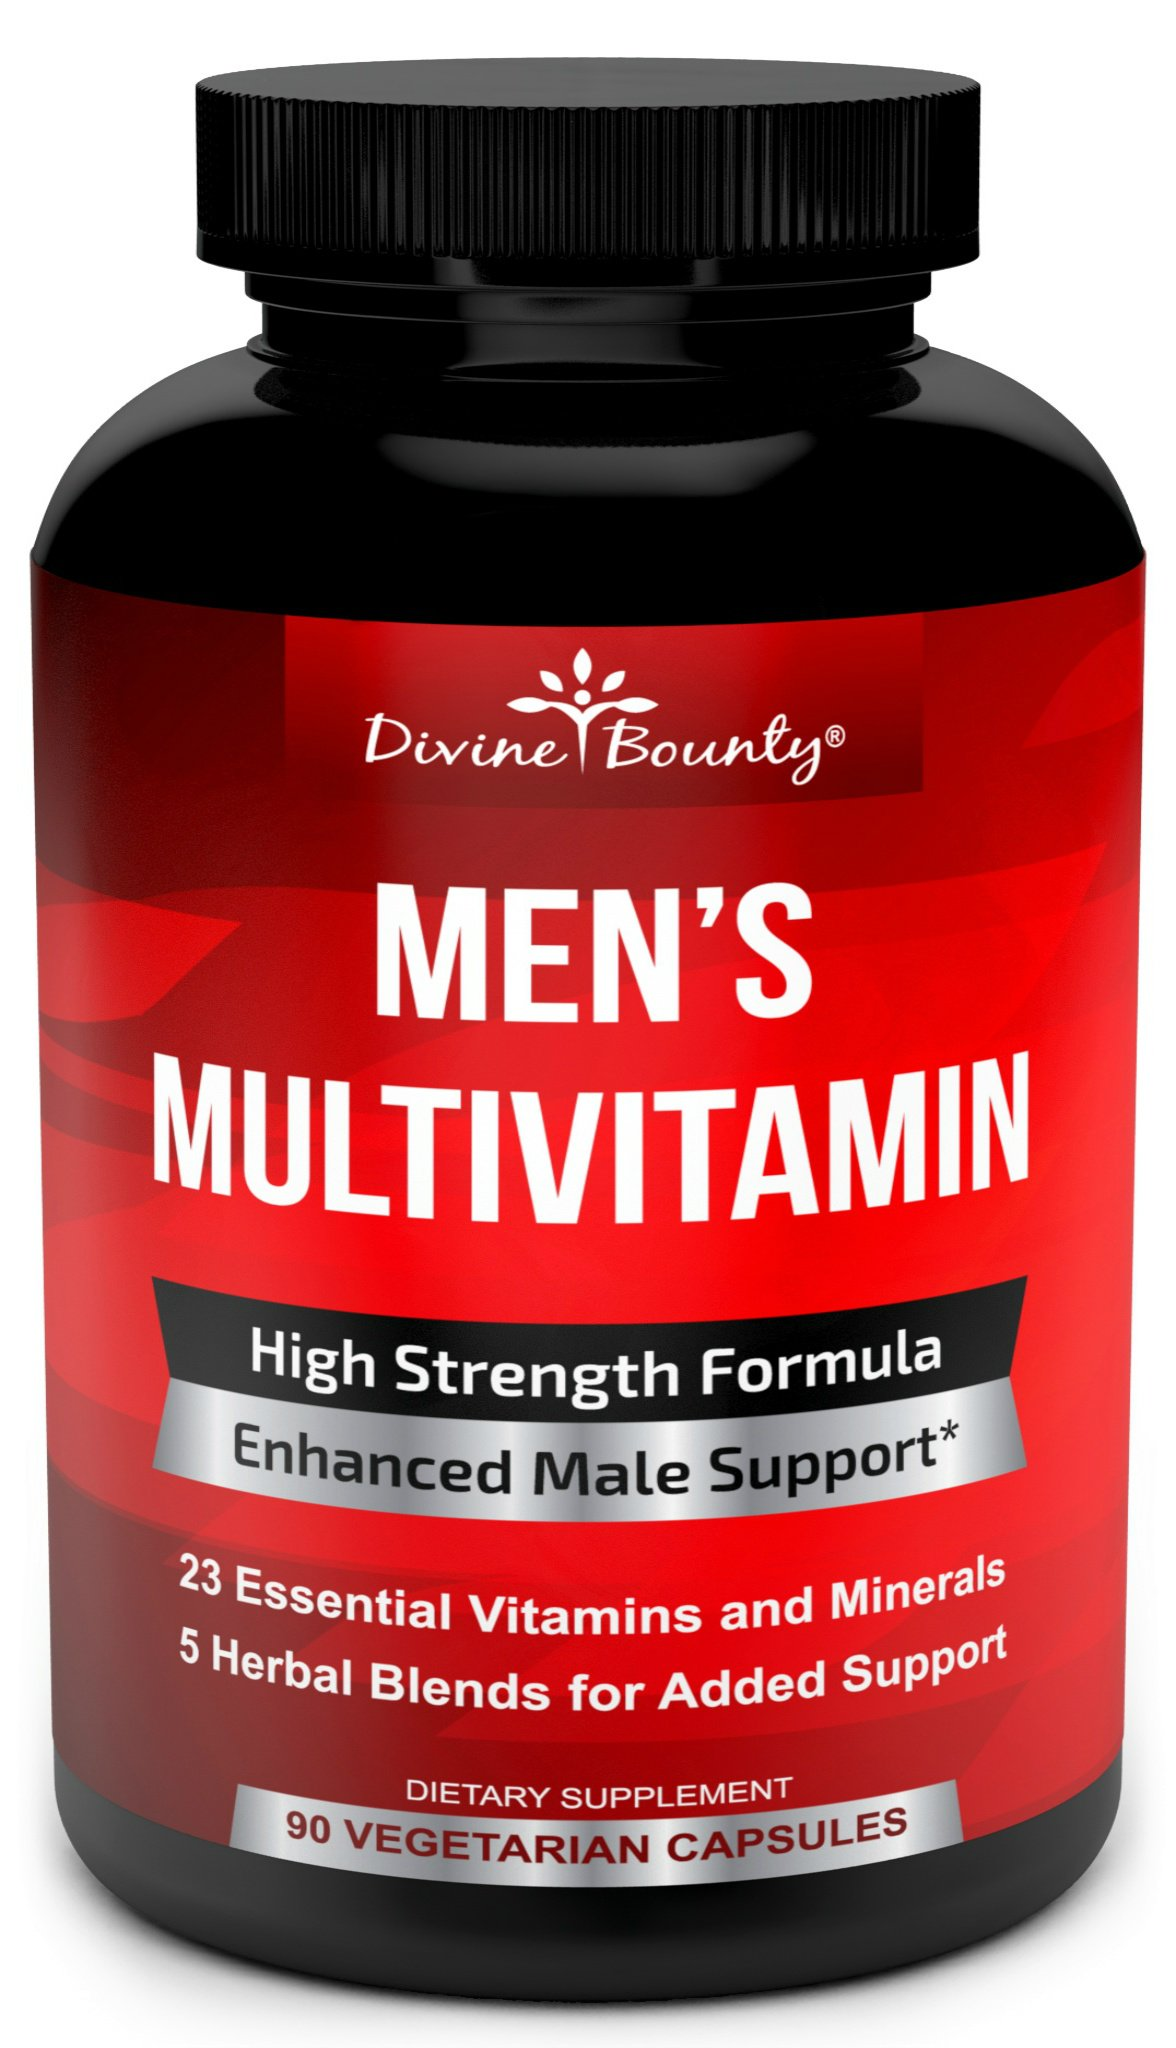 Nature S Bounty Multivitamin For Men